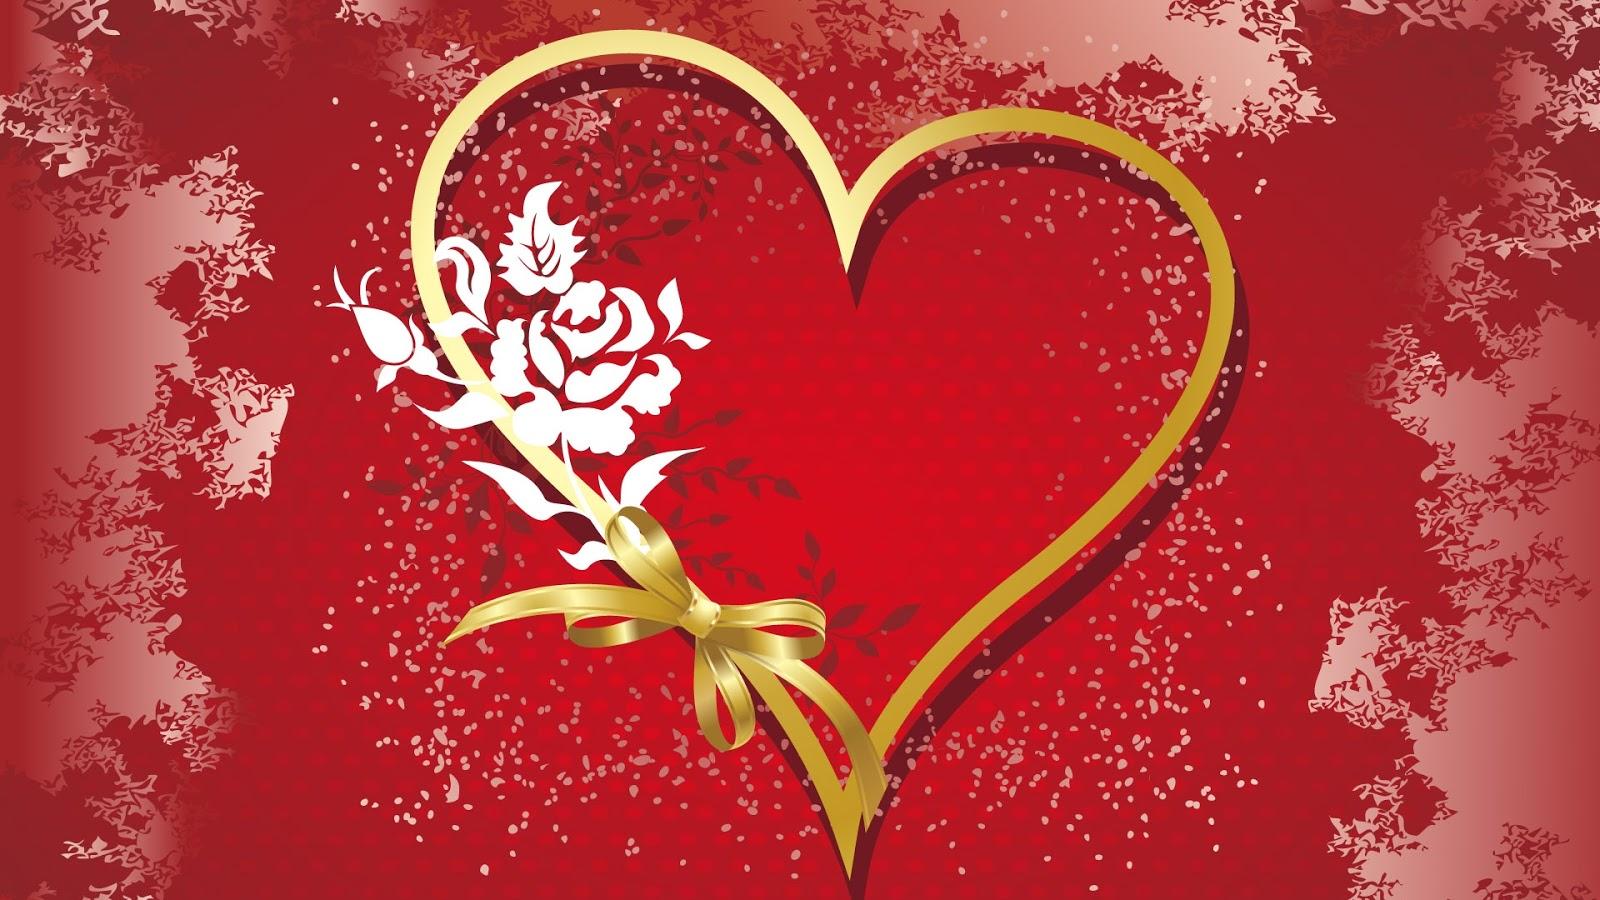 http://3.bp.blogspot.com/-9UC2VFtmWOk/URxRVdv7FTI/AAAAAAAAEqA/r0MYRg8gvi4/s1600/valentines-day-wallpaper-free.jpg